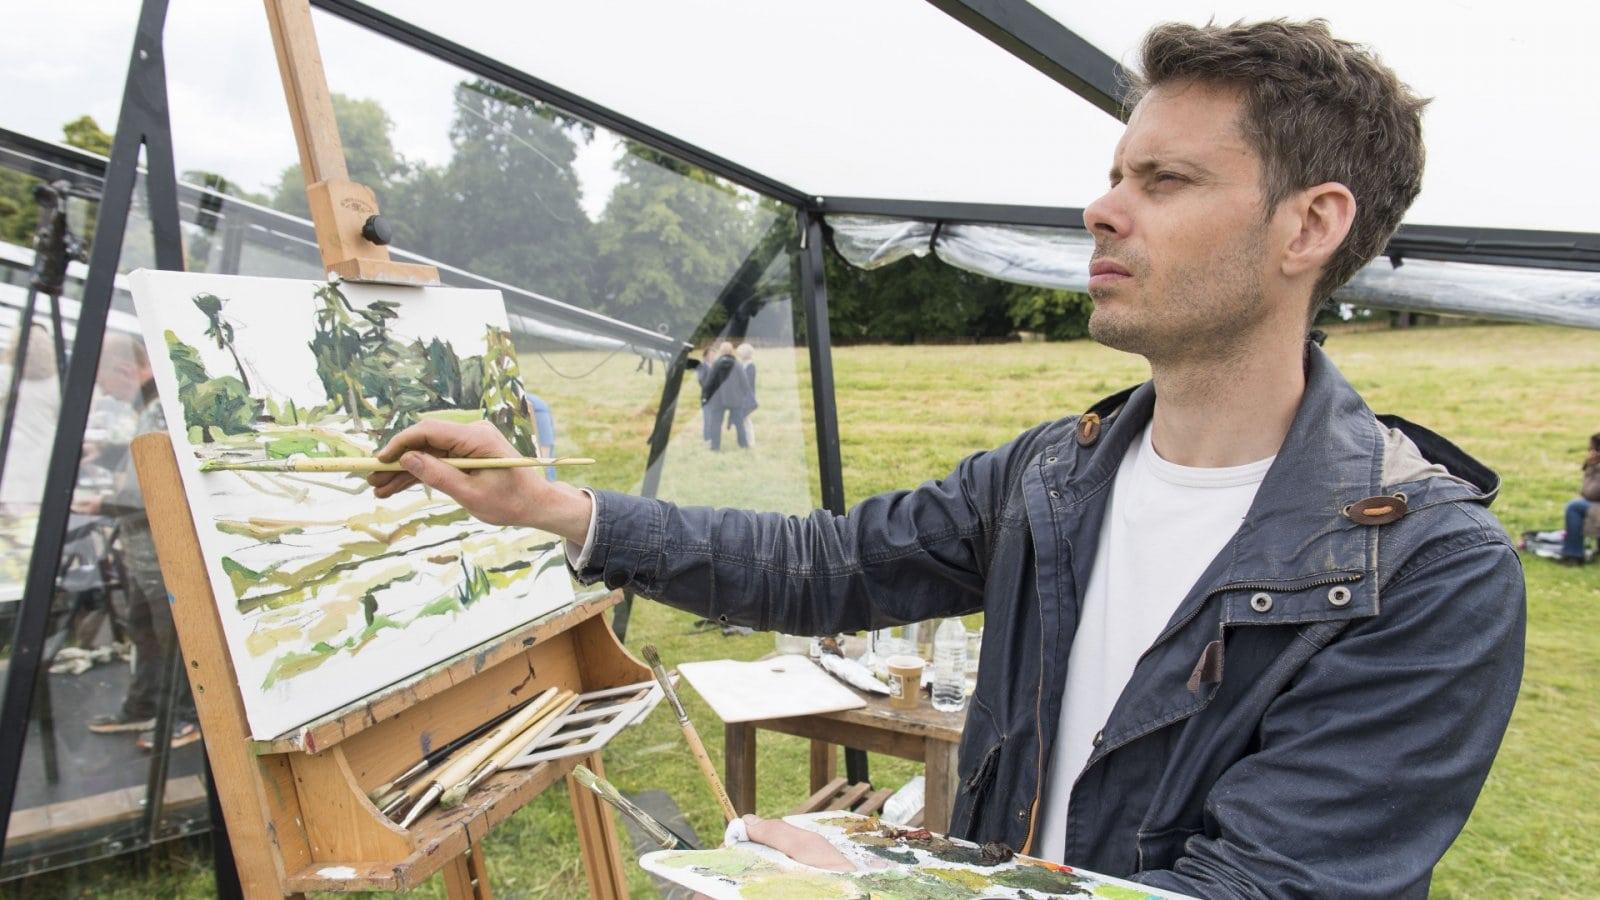 Richard Allen named Landscape Artist of the Year